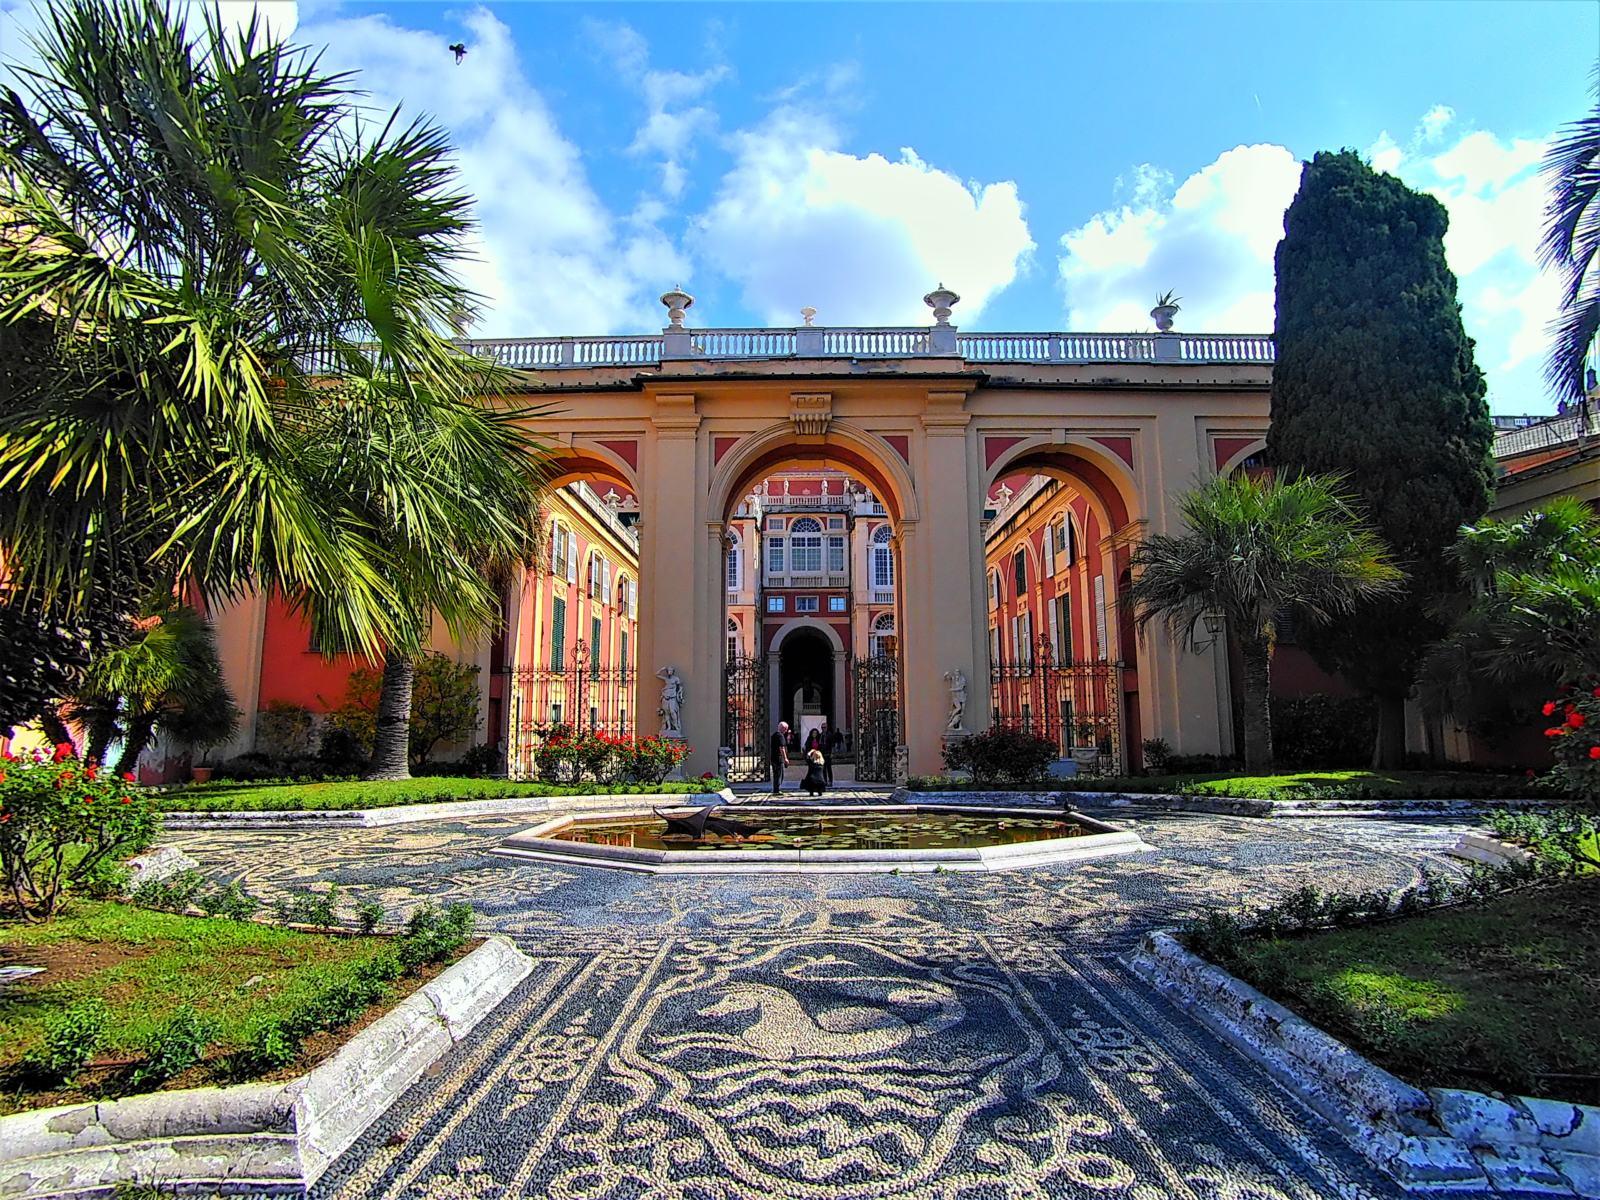 Giardino pensile di Palazzo Reale